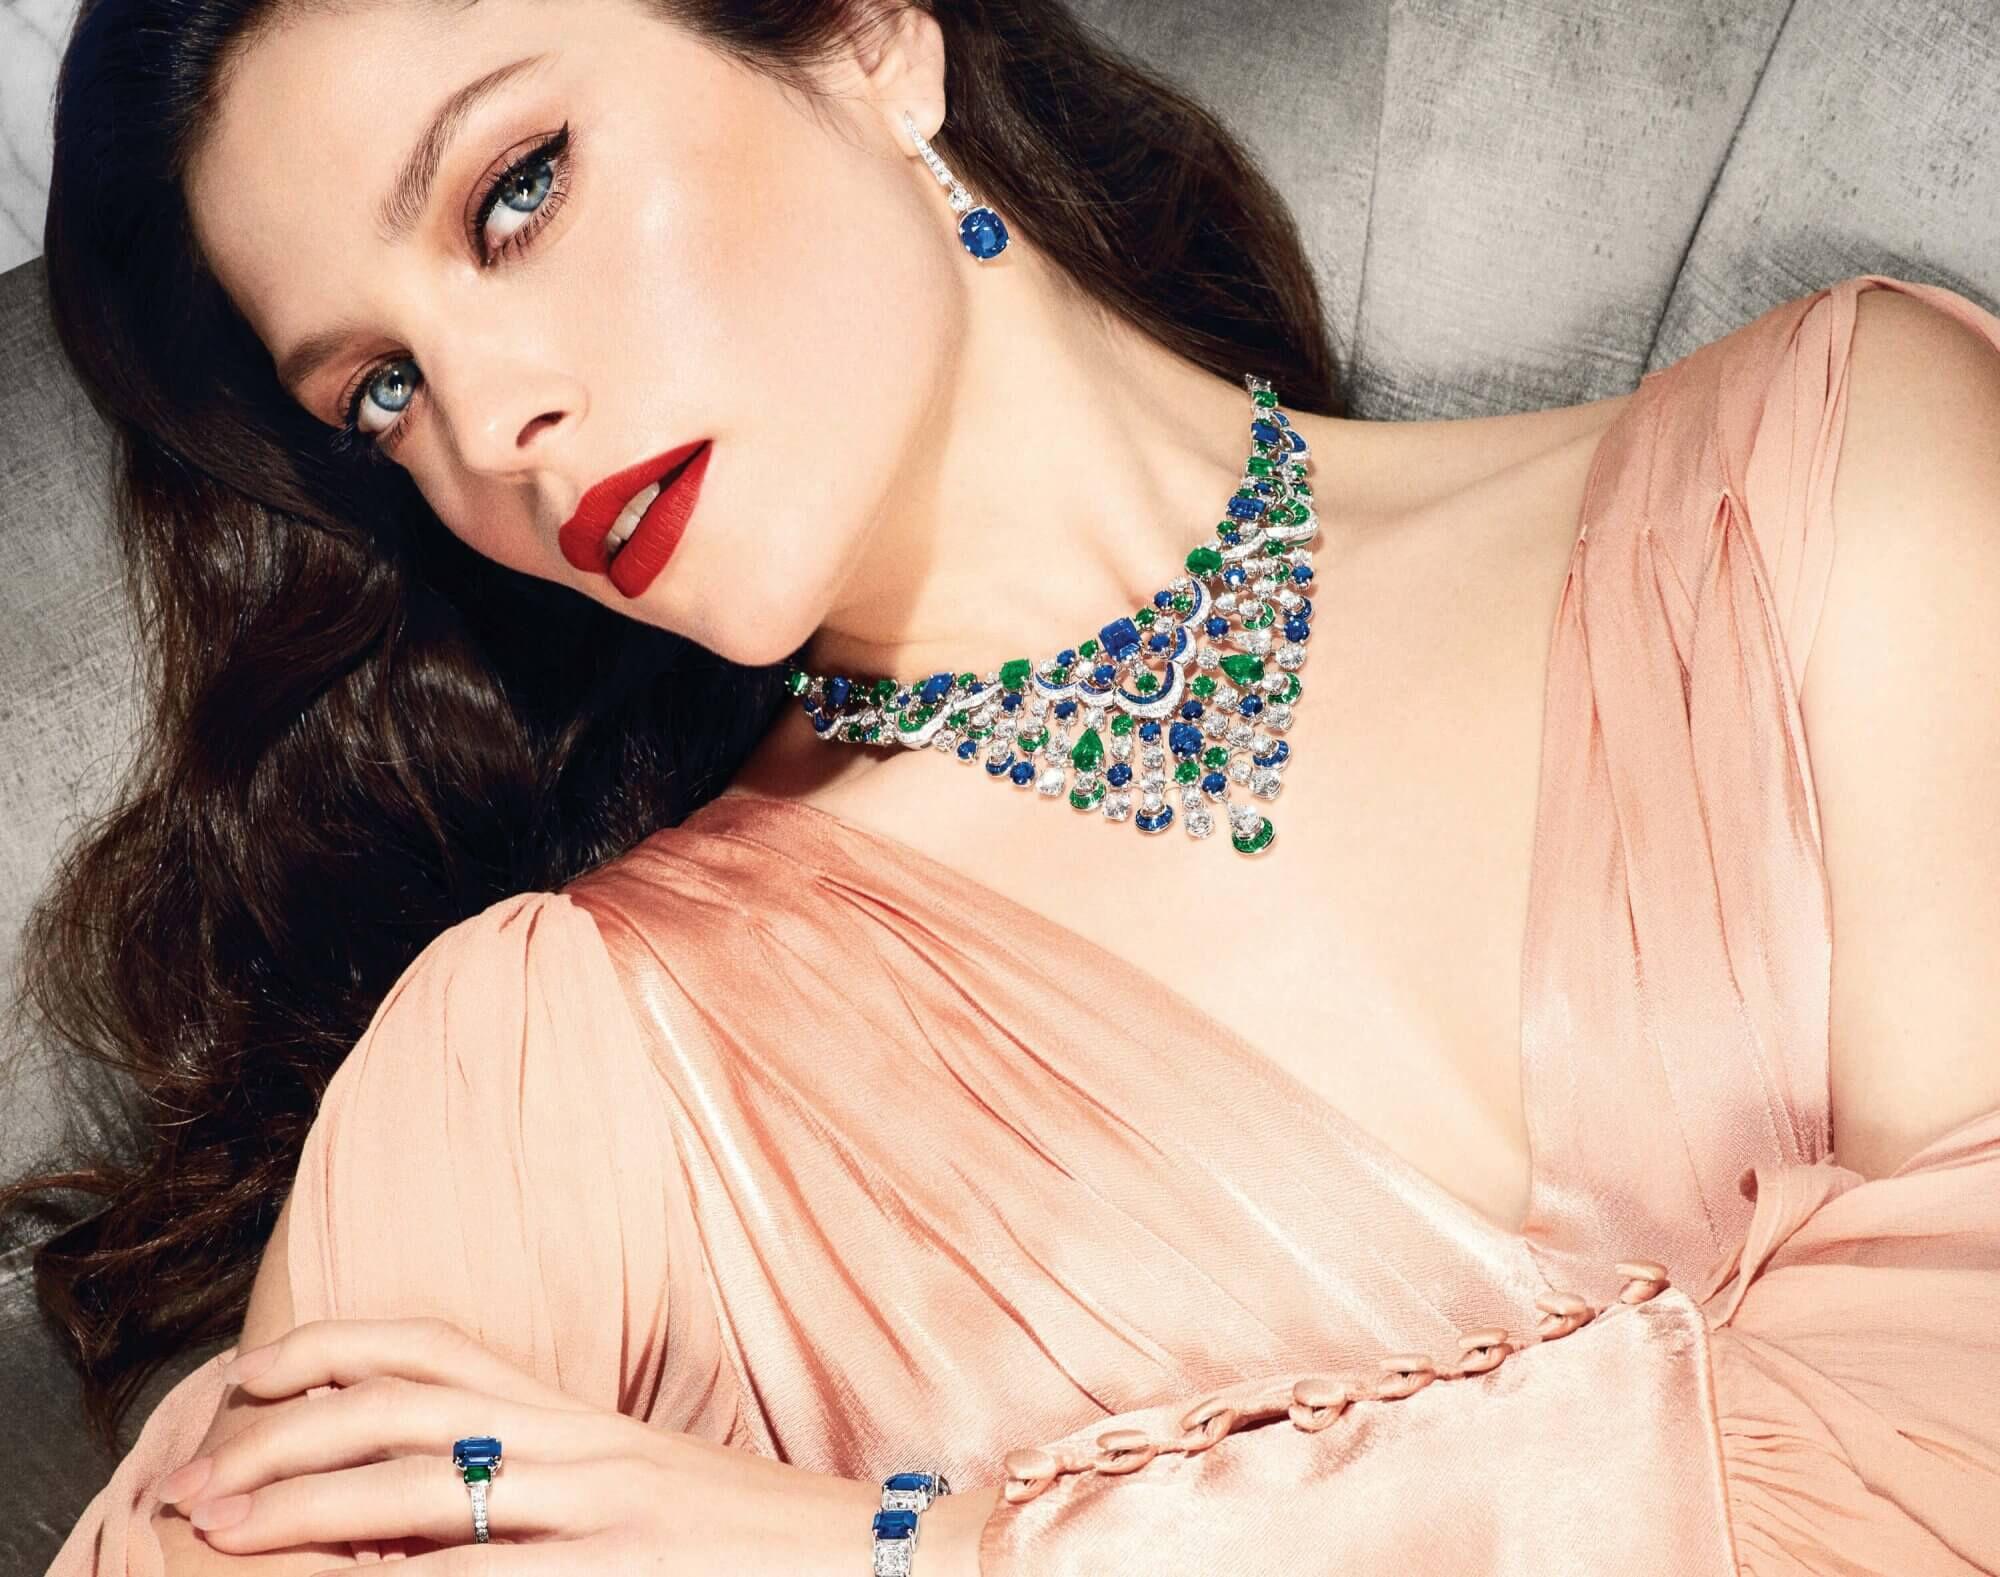 Model wears Graff Diamond earrings featuring a pair of 6cts Royal Blue cushion cut Sri Lankan sapphires.